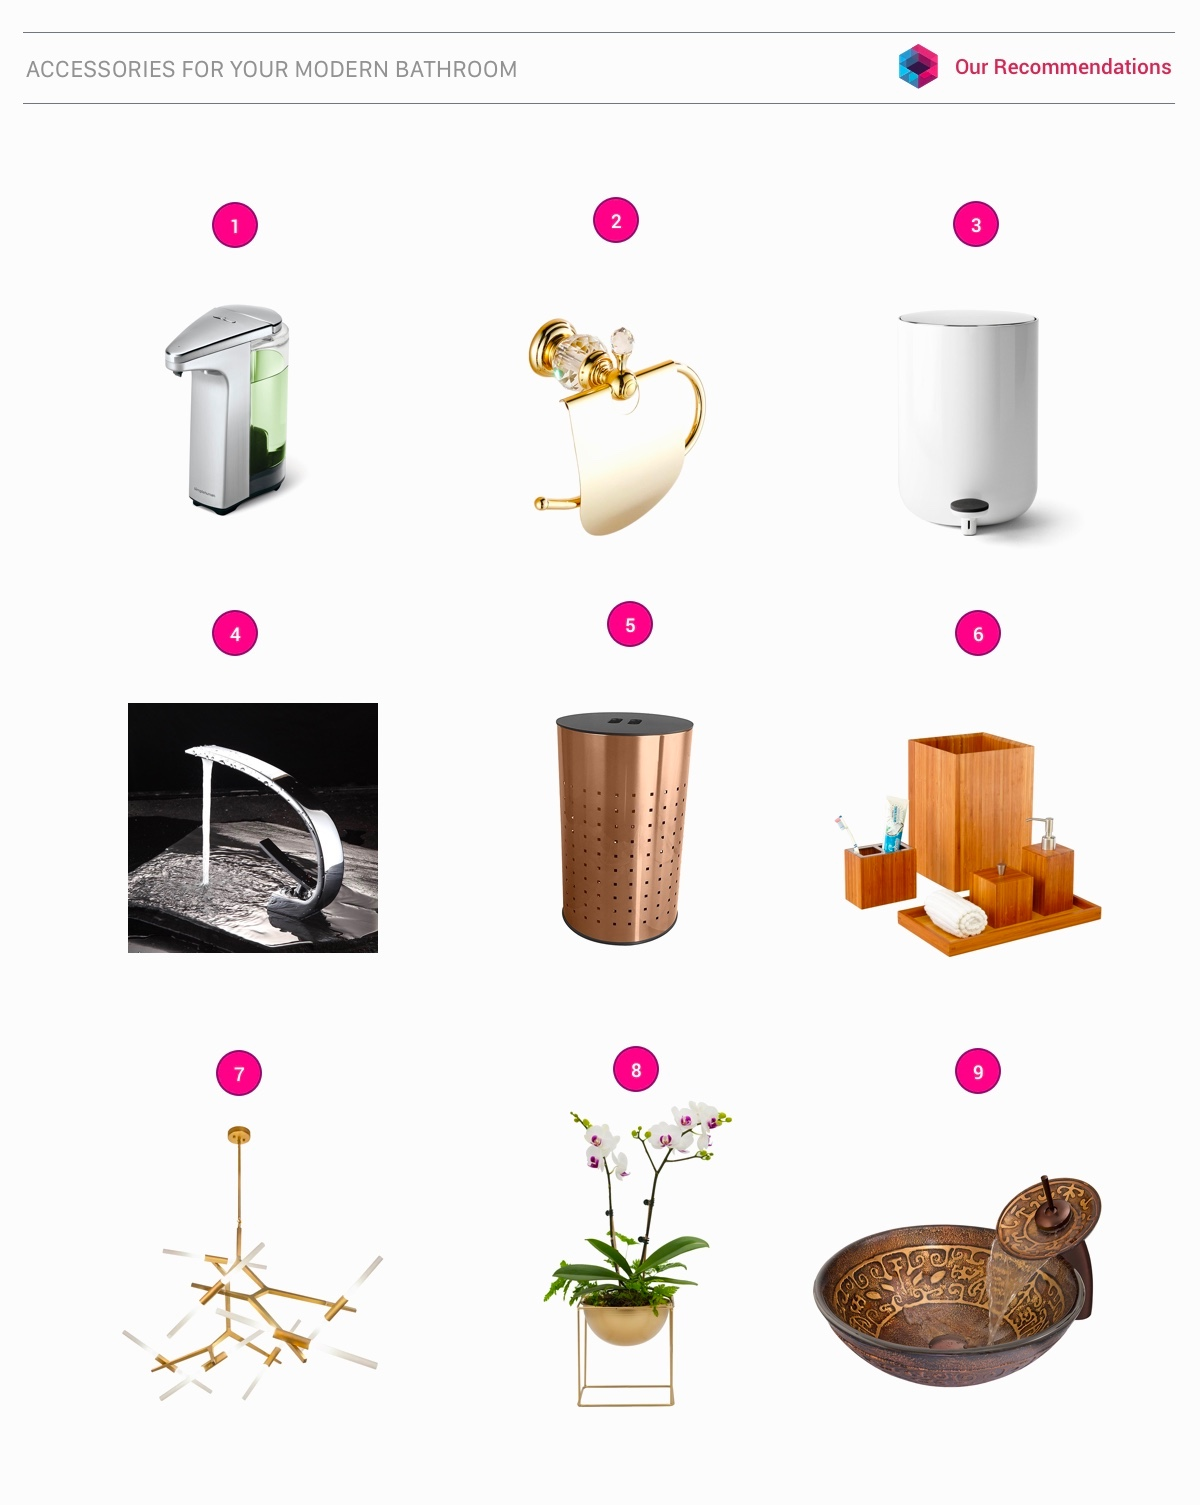 modern-bathroom-accessories-1